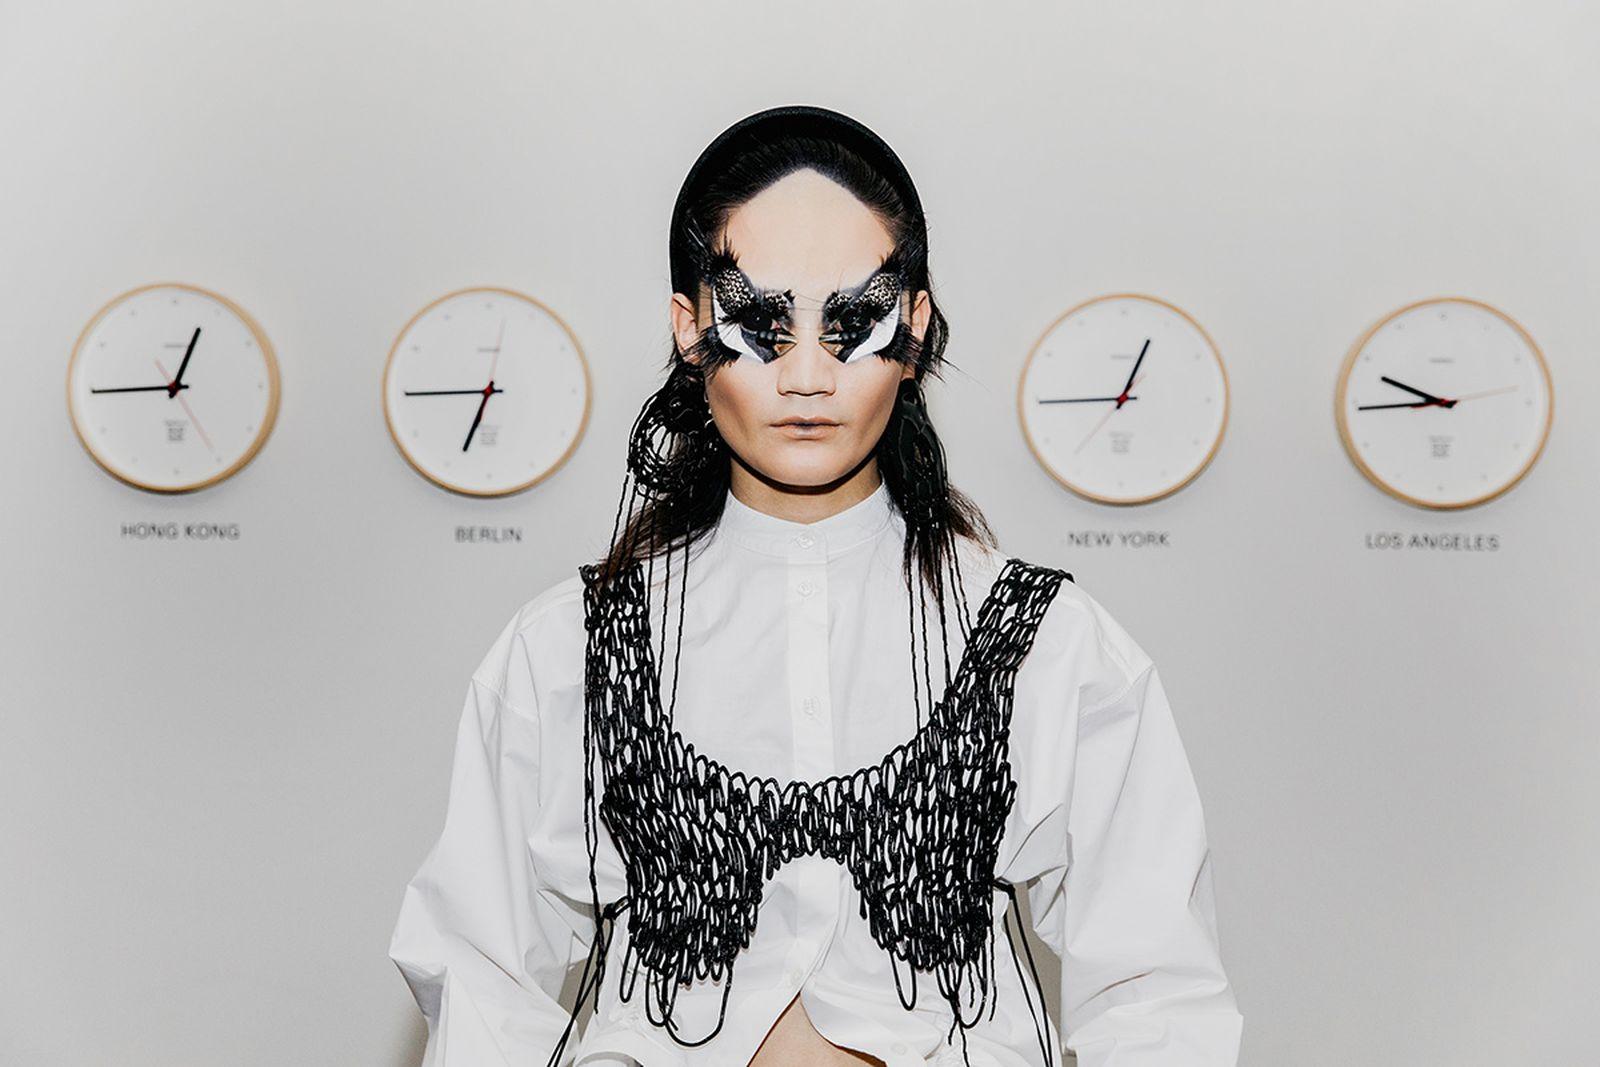 Shirt, Bra, Earrings: Kasia Kucharska, Trousers: Alexandru Plesco, Shoes: Christian Dior